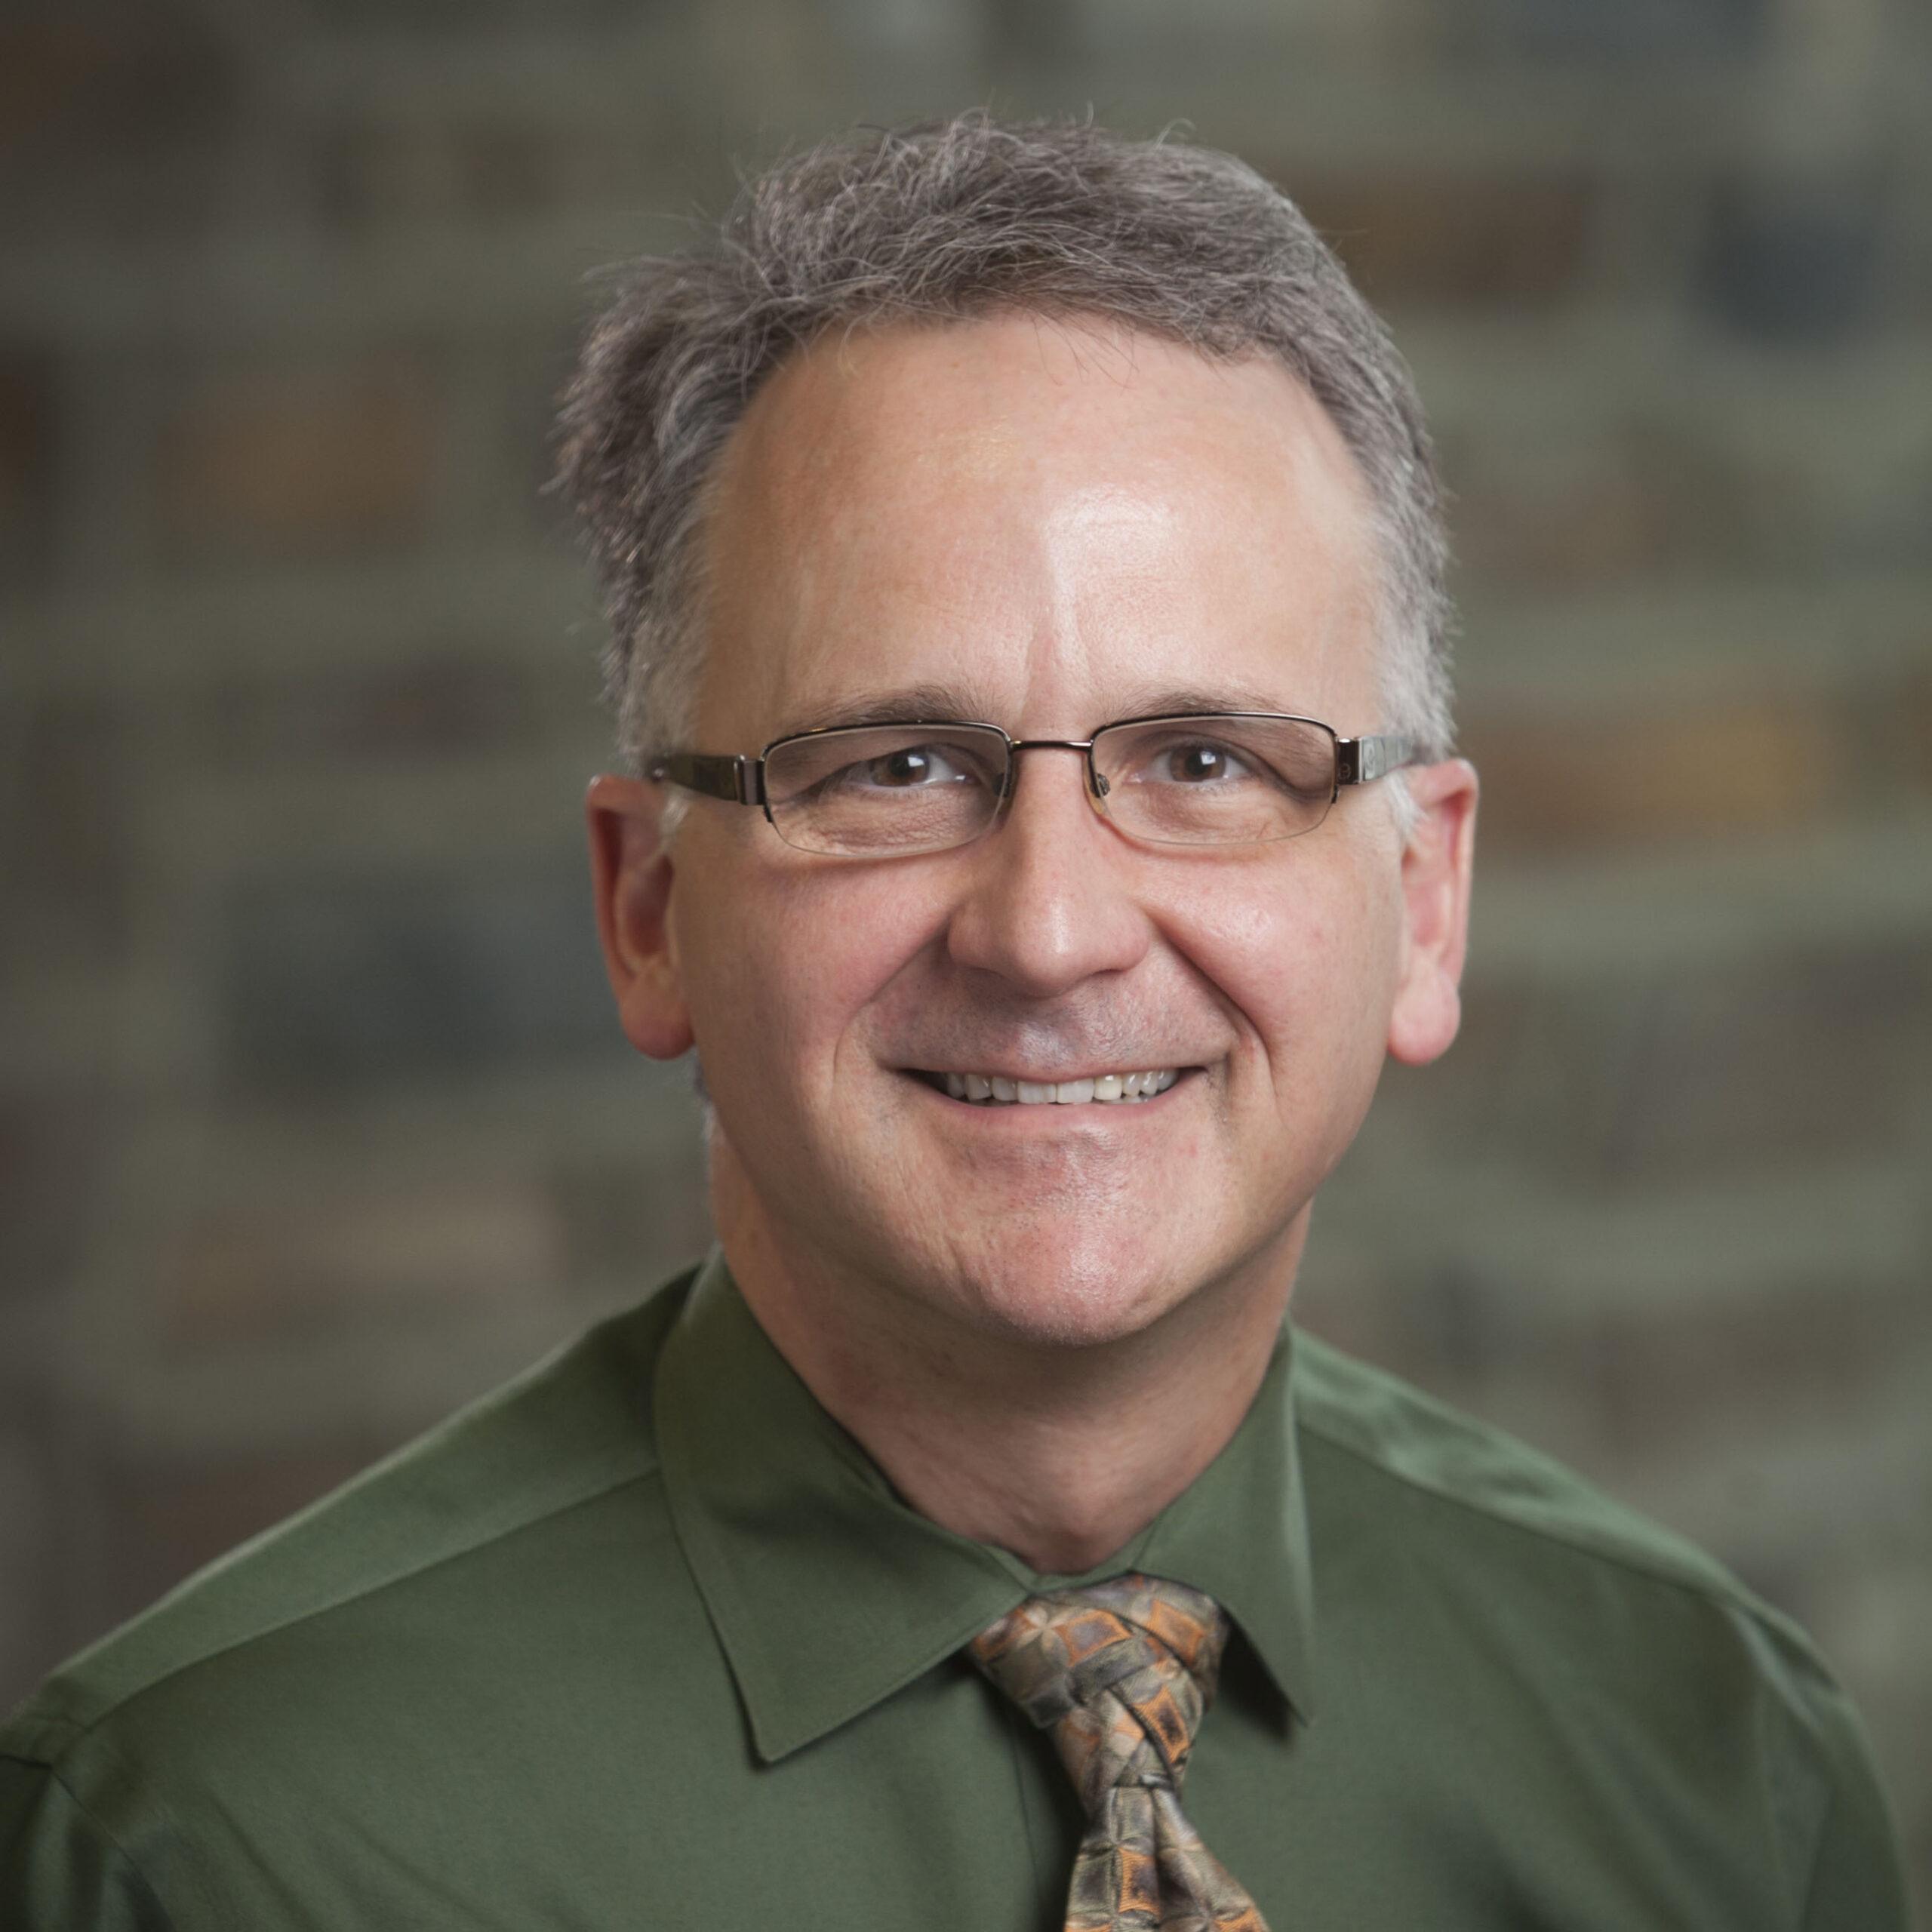 Dr. Tony Moody, Principal Investigator, Duke CIVIC Vaccine Center (DCVC)